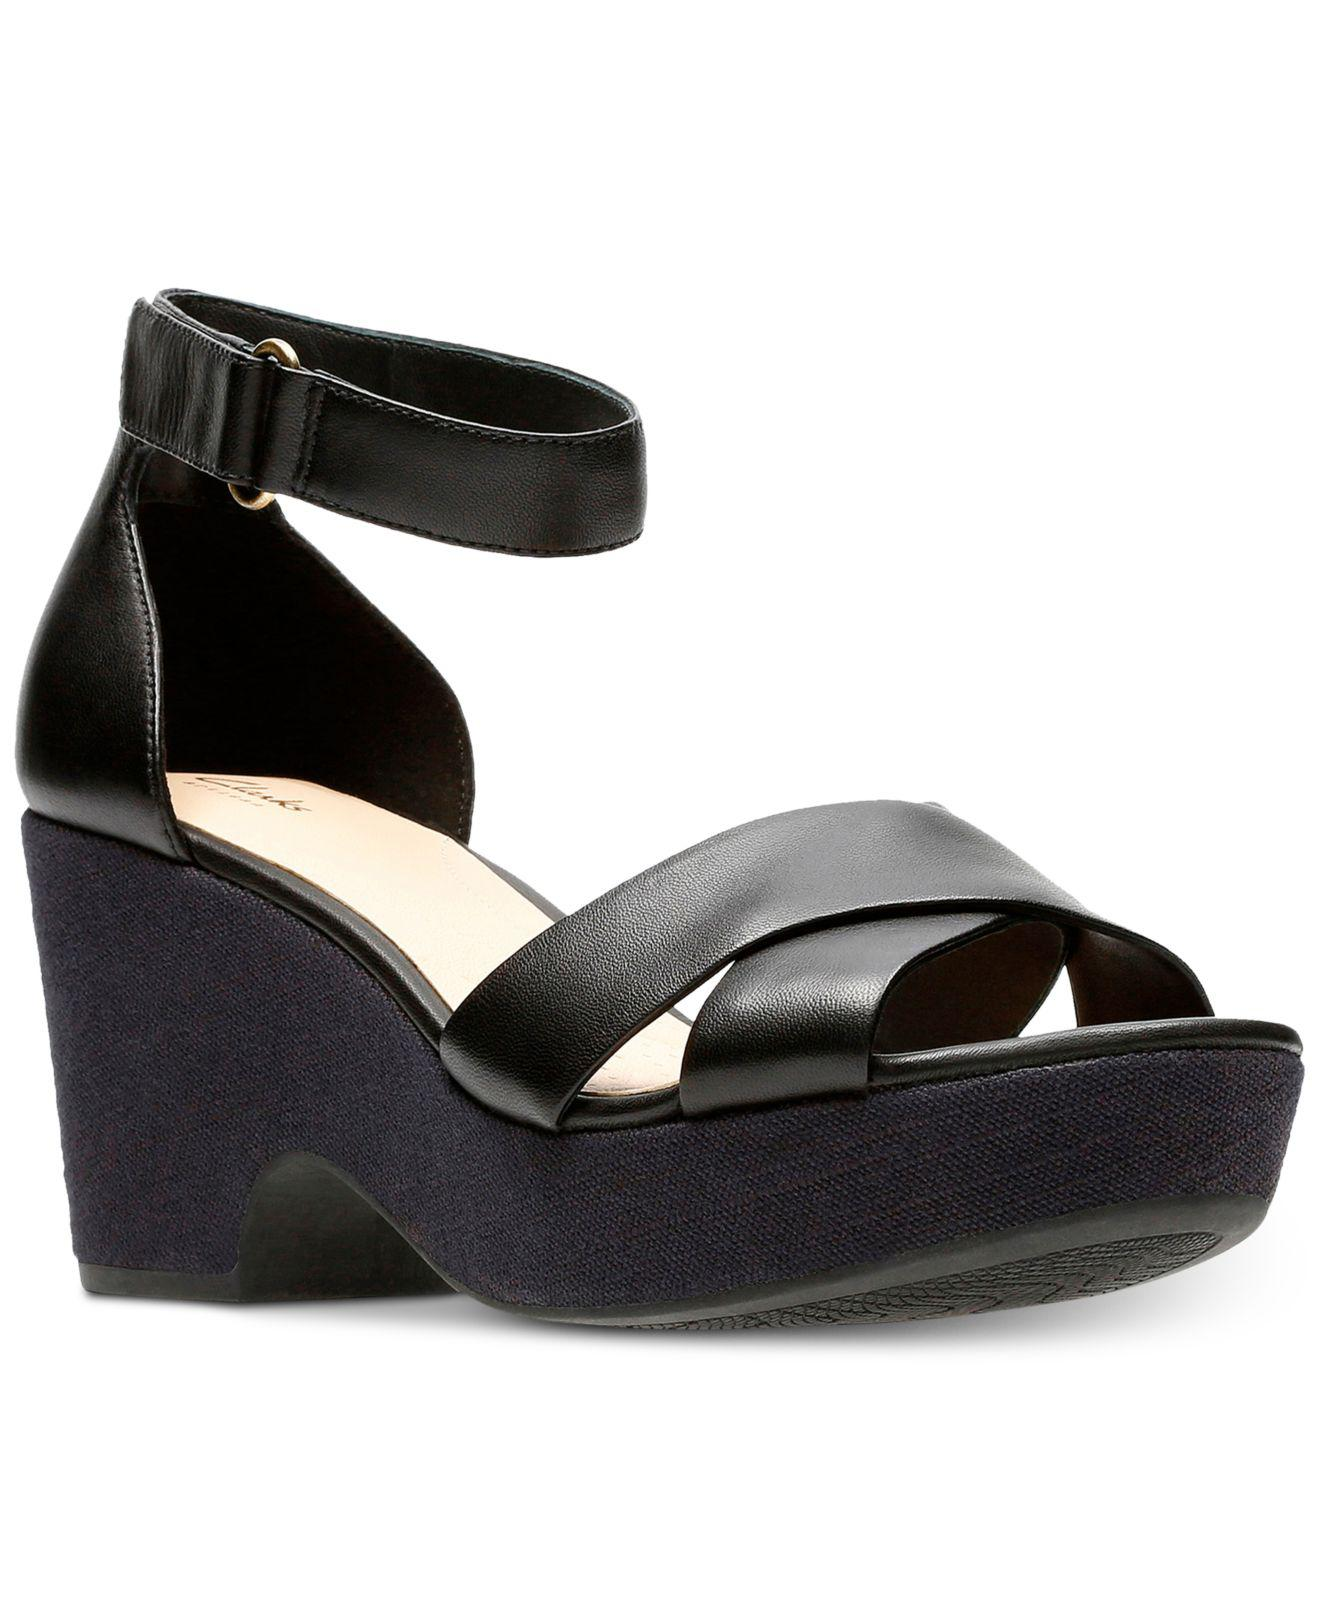 Clarks  Women's Black Maritsa Ruth Wedge Sandals